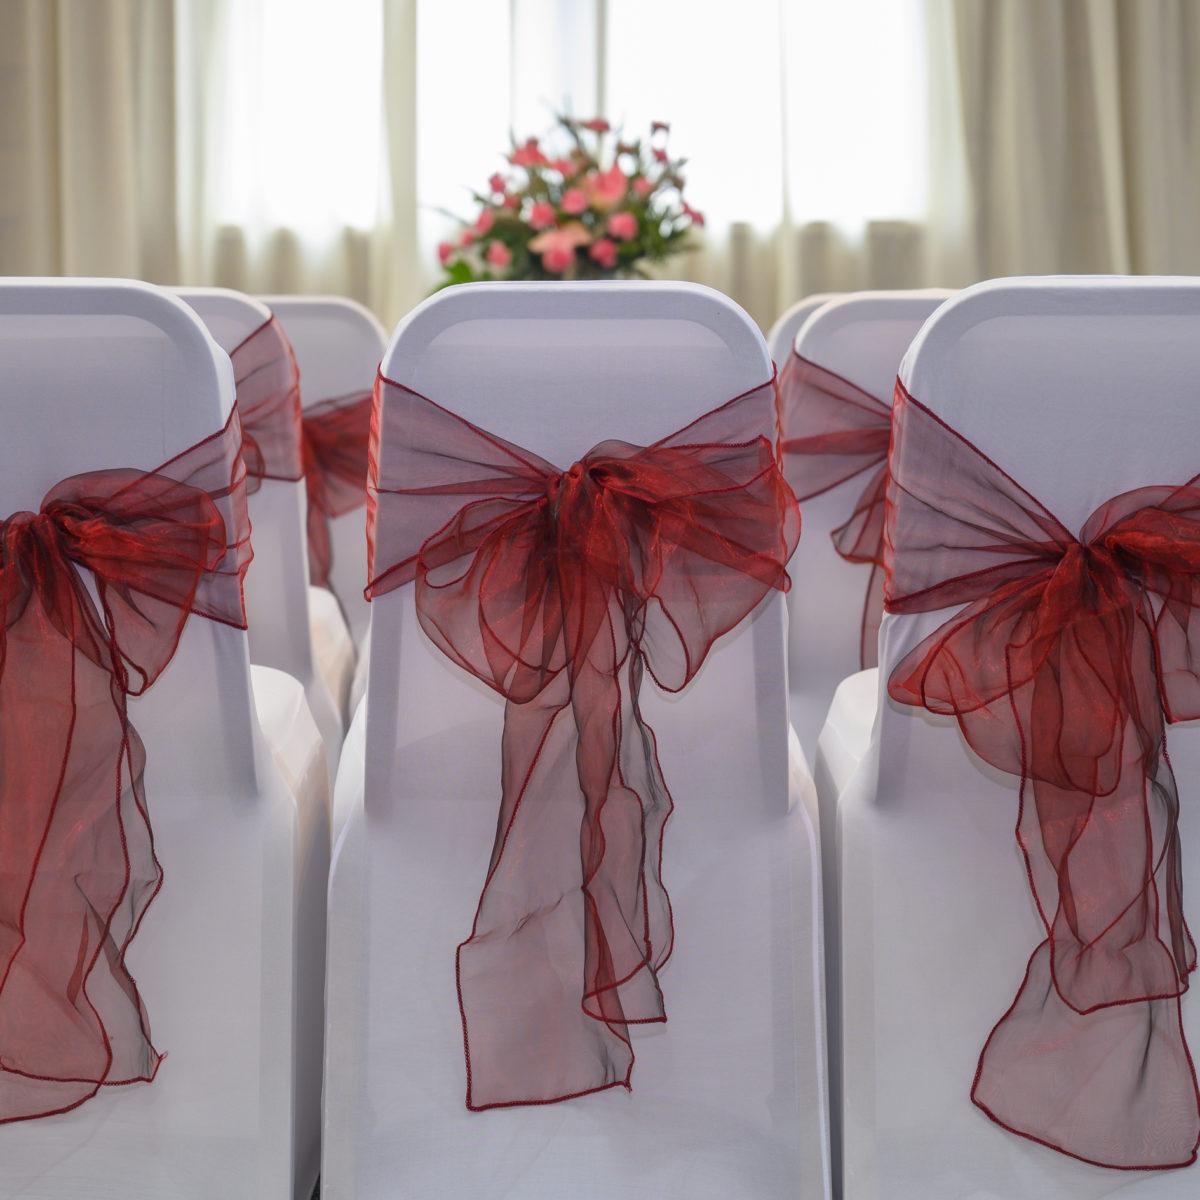 Weddings in the Scottish Borders